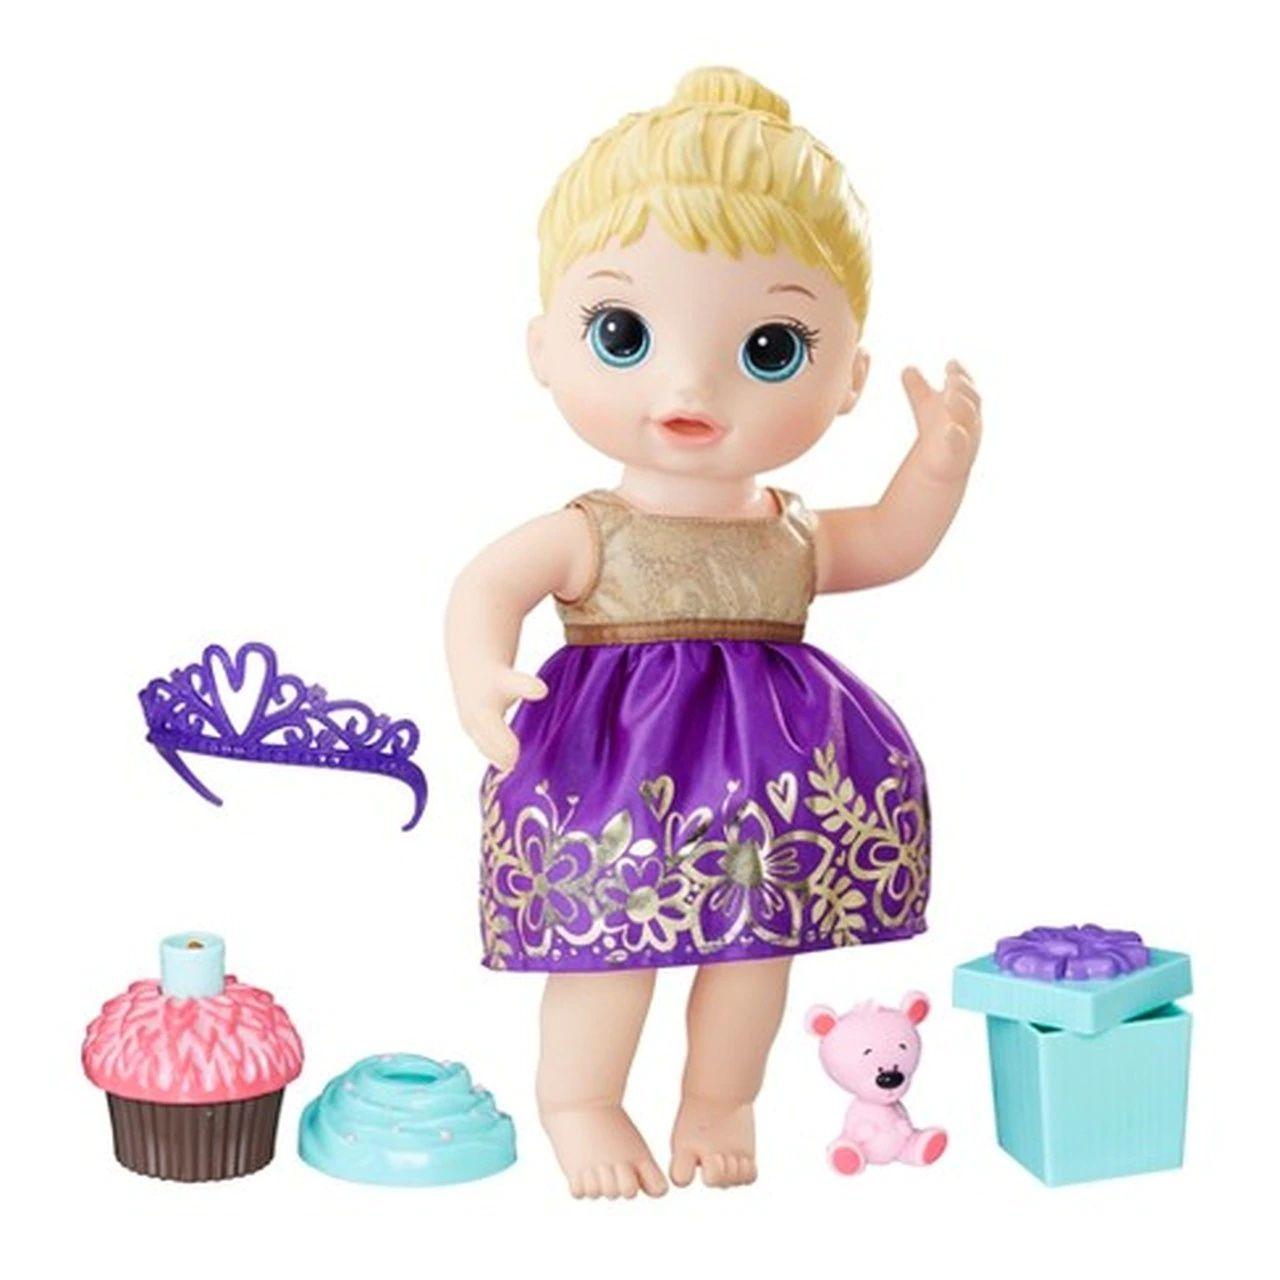 Boneca Baby Alive Loira - Festa Surpresa - Hasbro Original